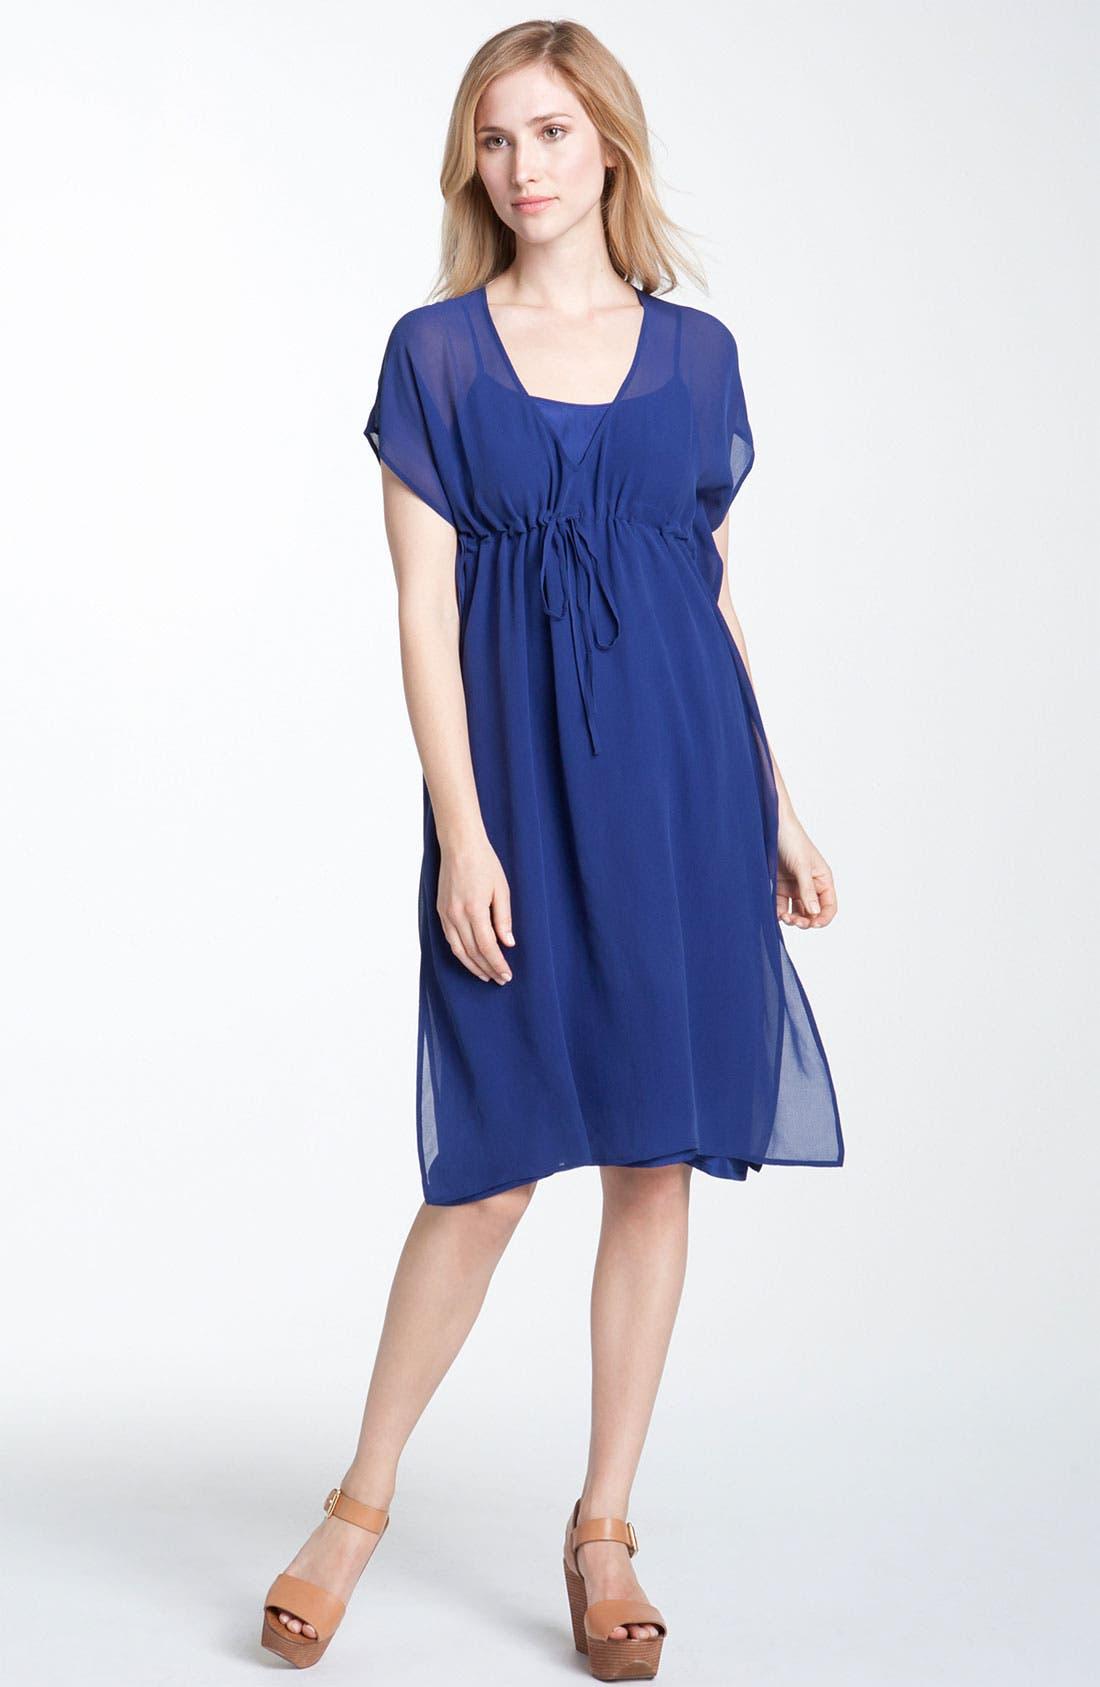 Alternate Image 1 Selected - Eileen Fisher V-Neck Silk Chiffon Dress